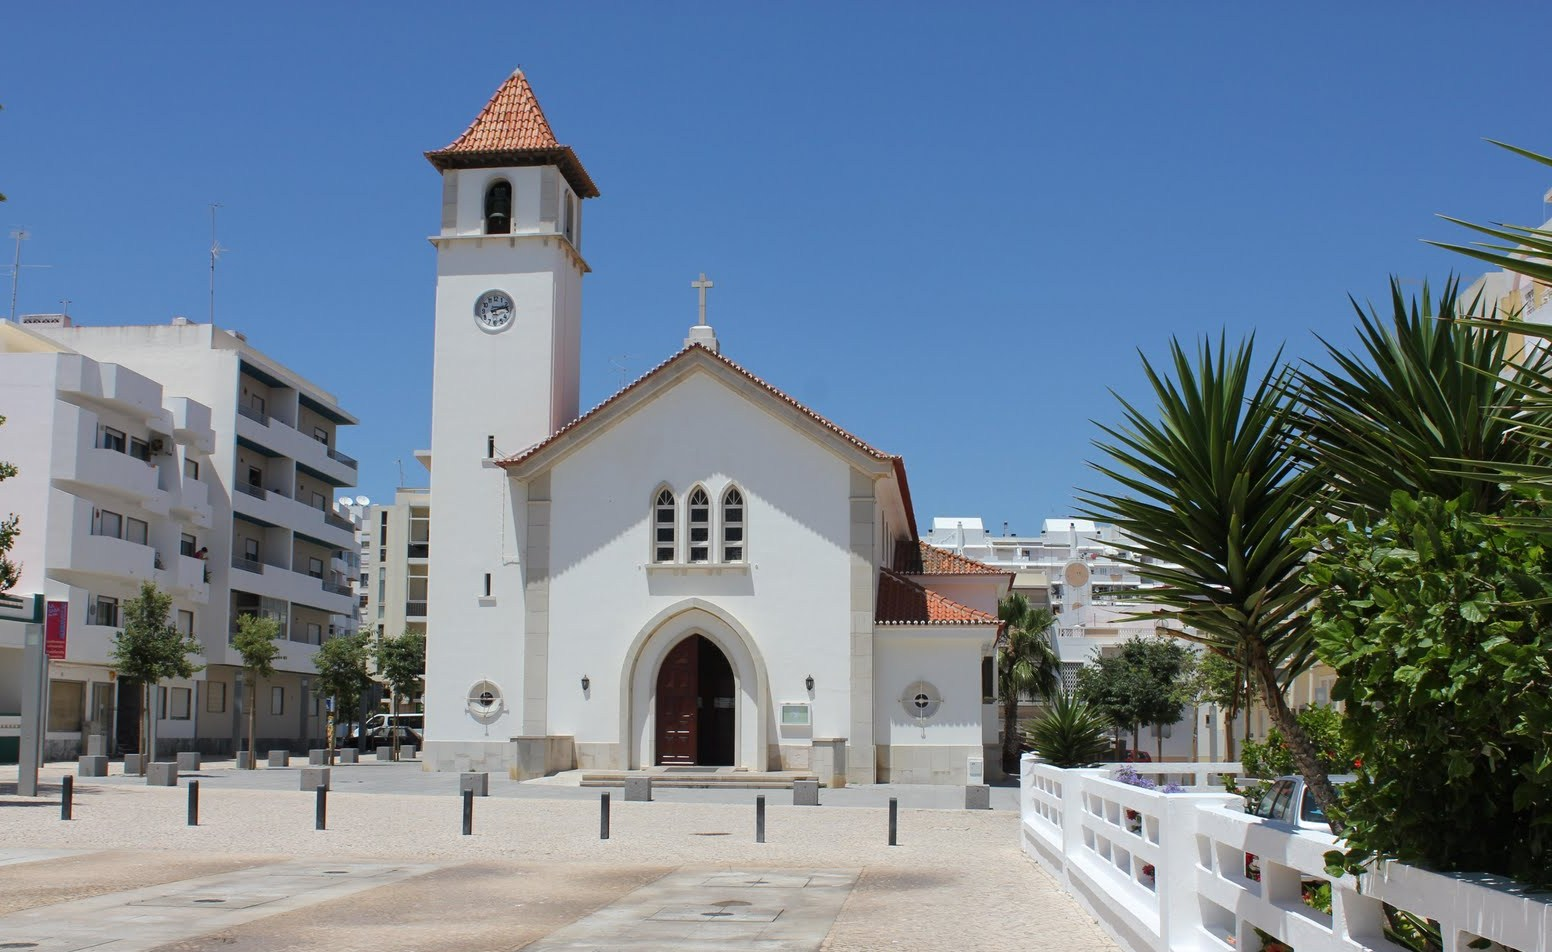 Holiday apartments and villas for rent, Appartement 300m de la plage – Armação de Pêra in Armação de Pêra, Portugal Algarve, REF_IMG_6778_8764